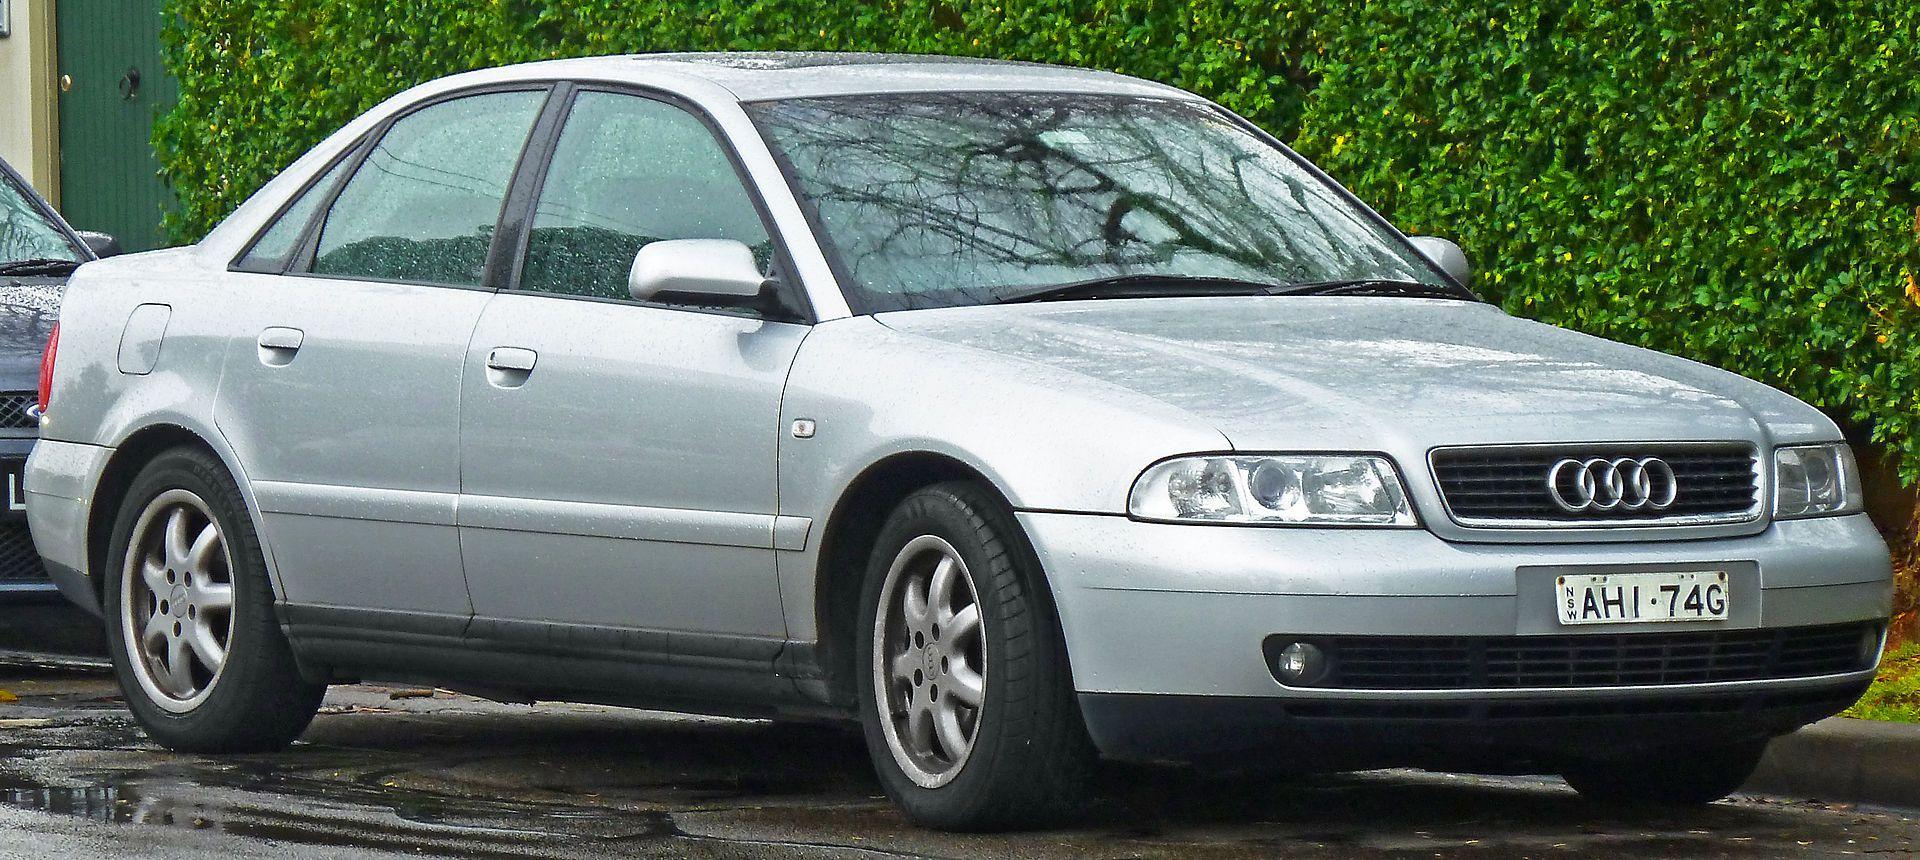 1999 2001 Audi A4 8d 1 8 T Quattro Sedan 2011 08 17 01 Audi A4 Wikipedia Volvo S40 Volvo Audi A4